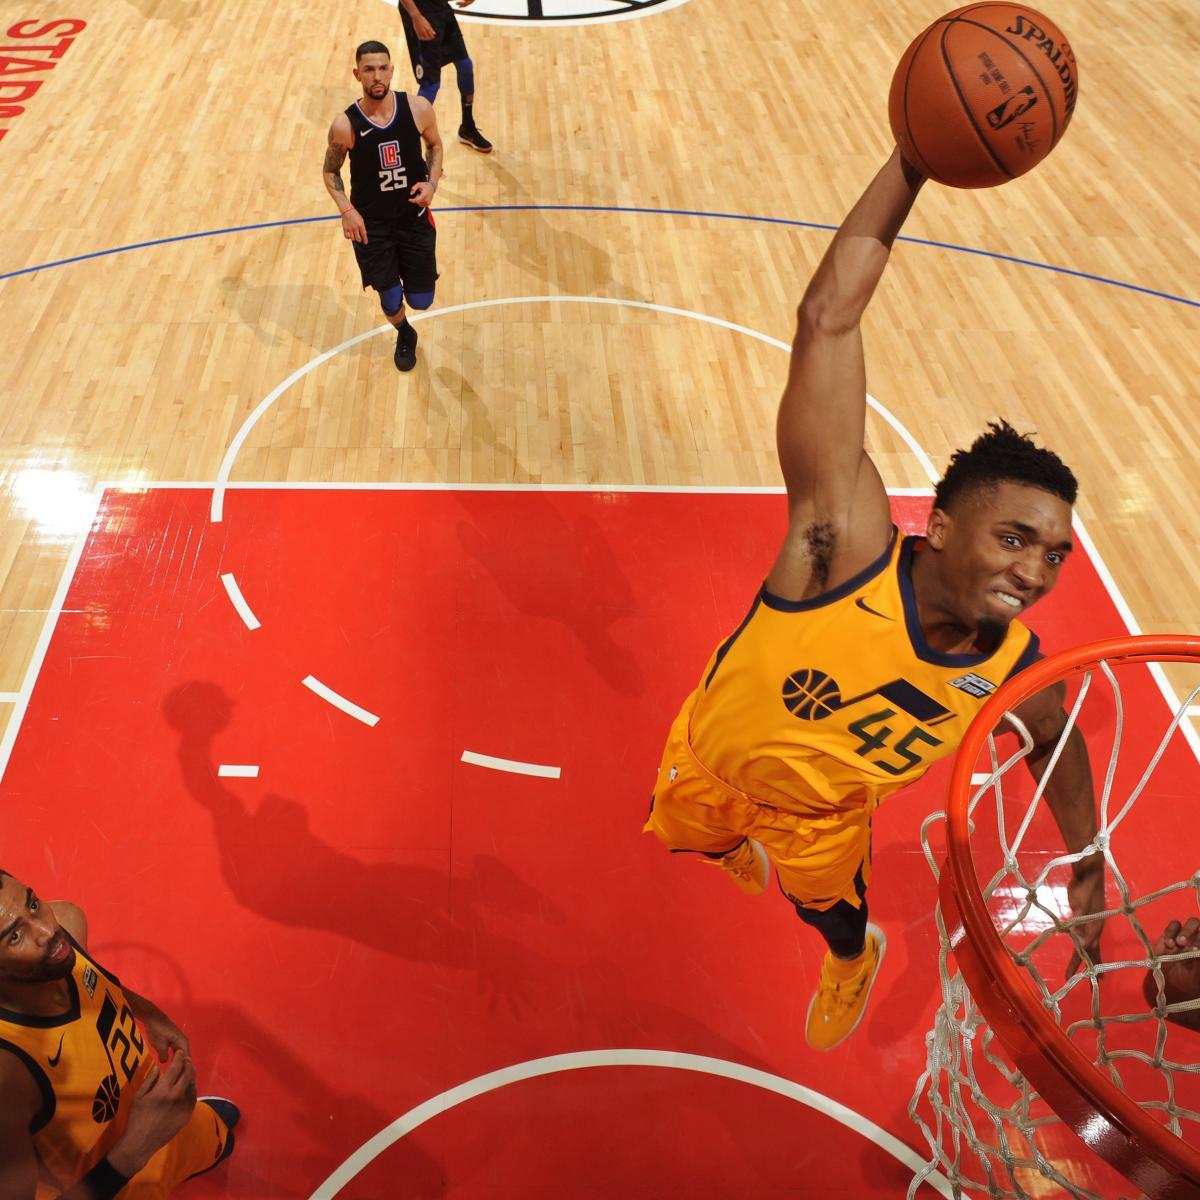 5 Nba Rookies Who Could Be Next Season S Donovan Mitchell: Jazz Guard Donovan Mitchell Sets Franchise Rookie Record